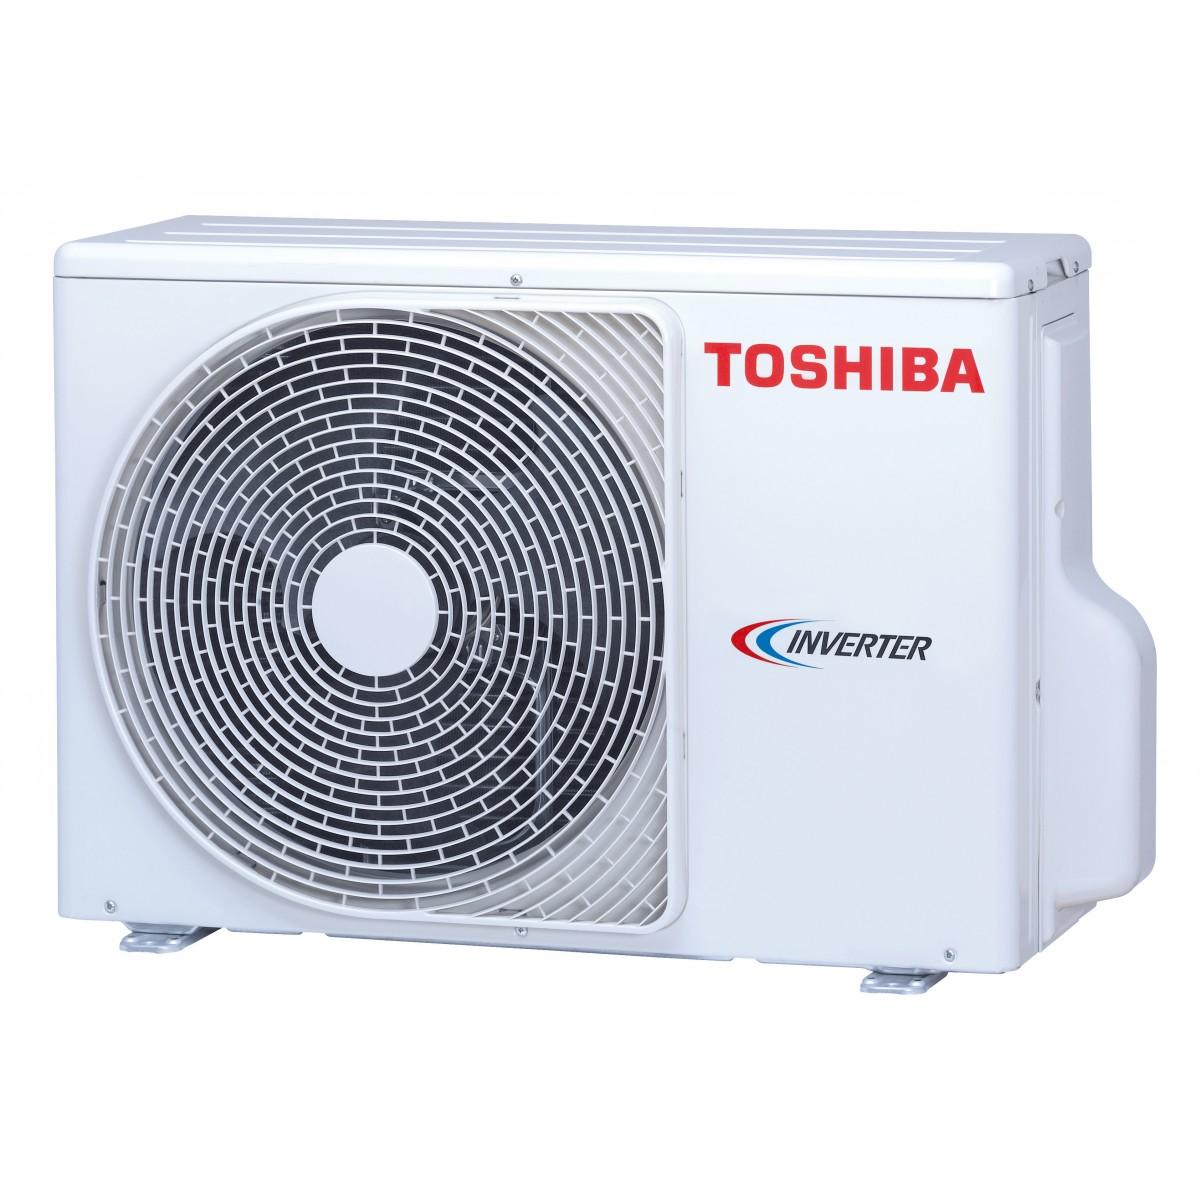 Toshiba venkovní multisplitová jednotka RAS-3M18U2AVG-E 5,2 kW